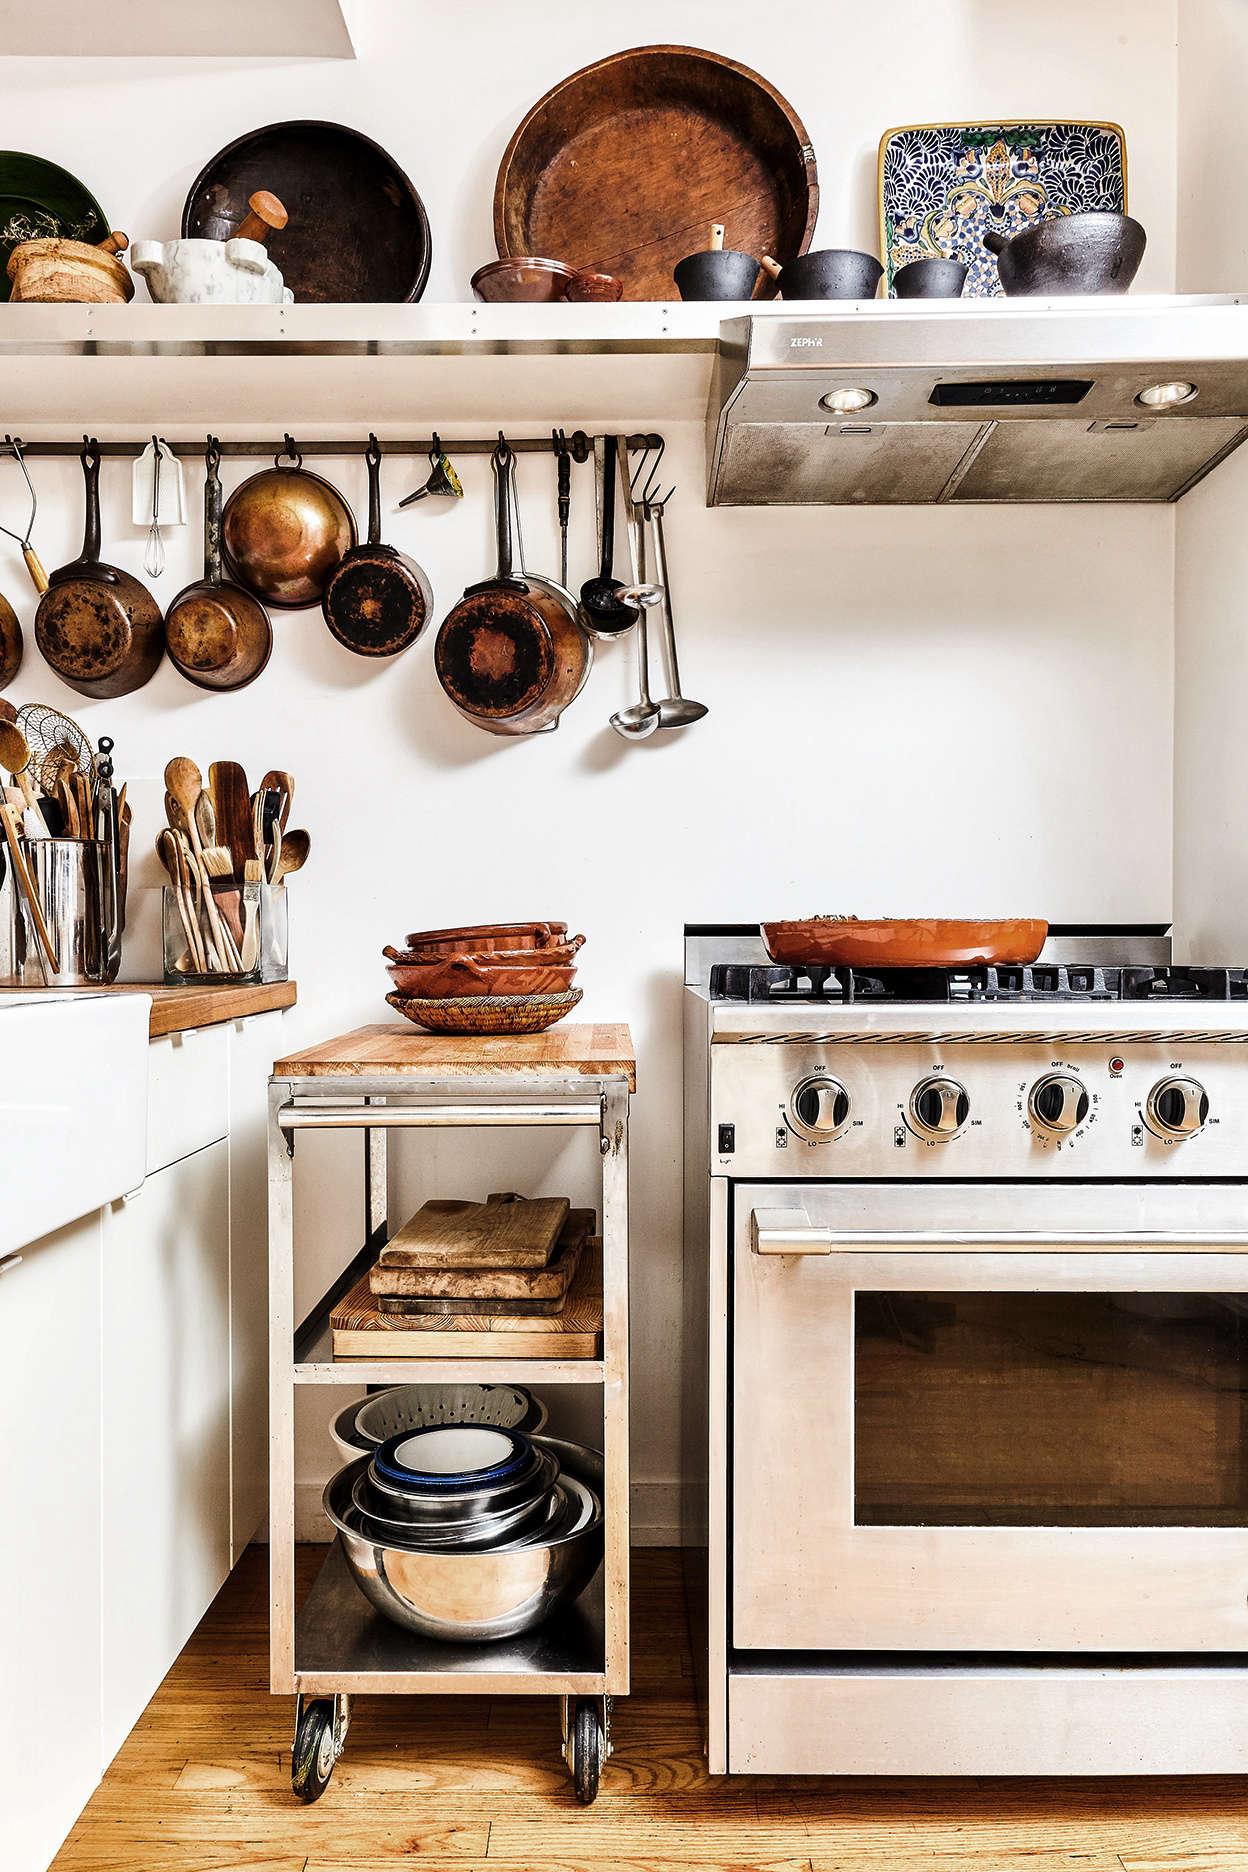 ideas hoods kitchen to zephyr next best in under range hood gas shelves cabinet built